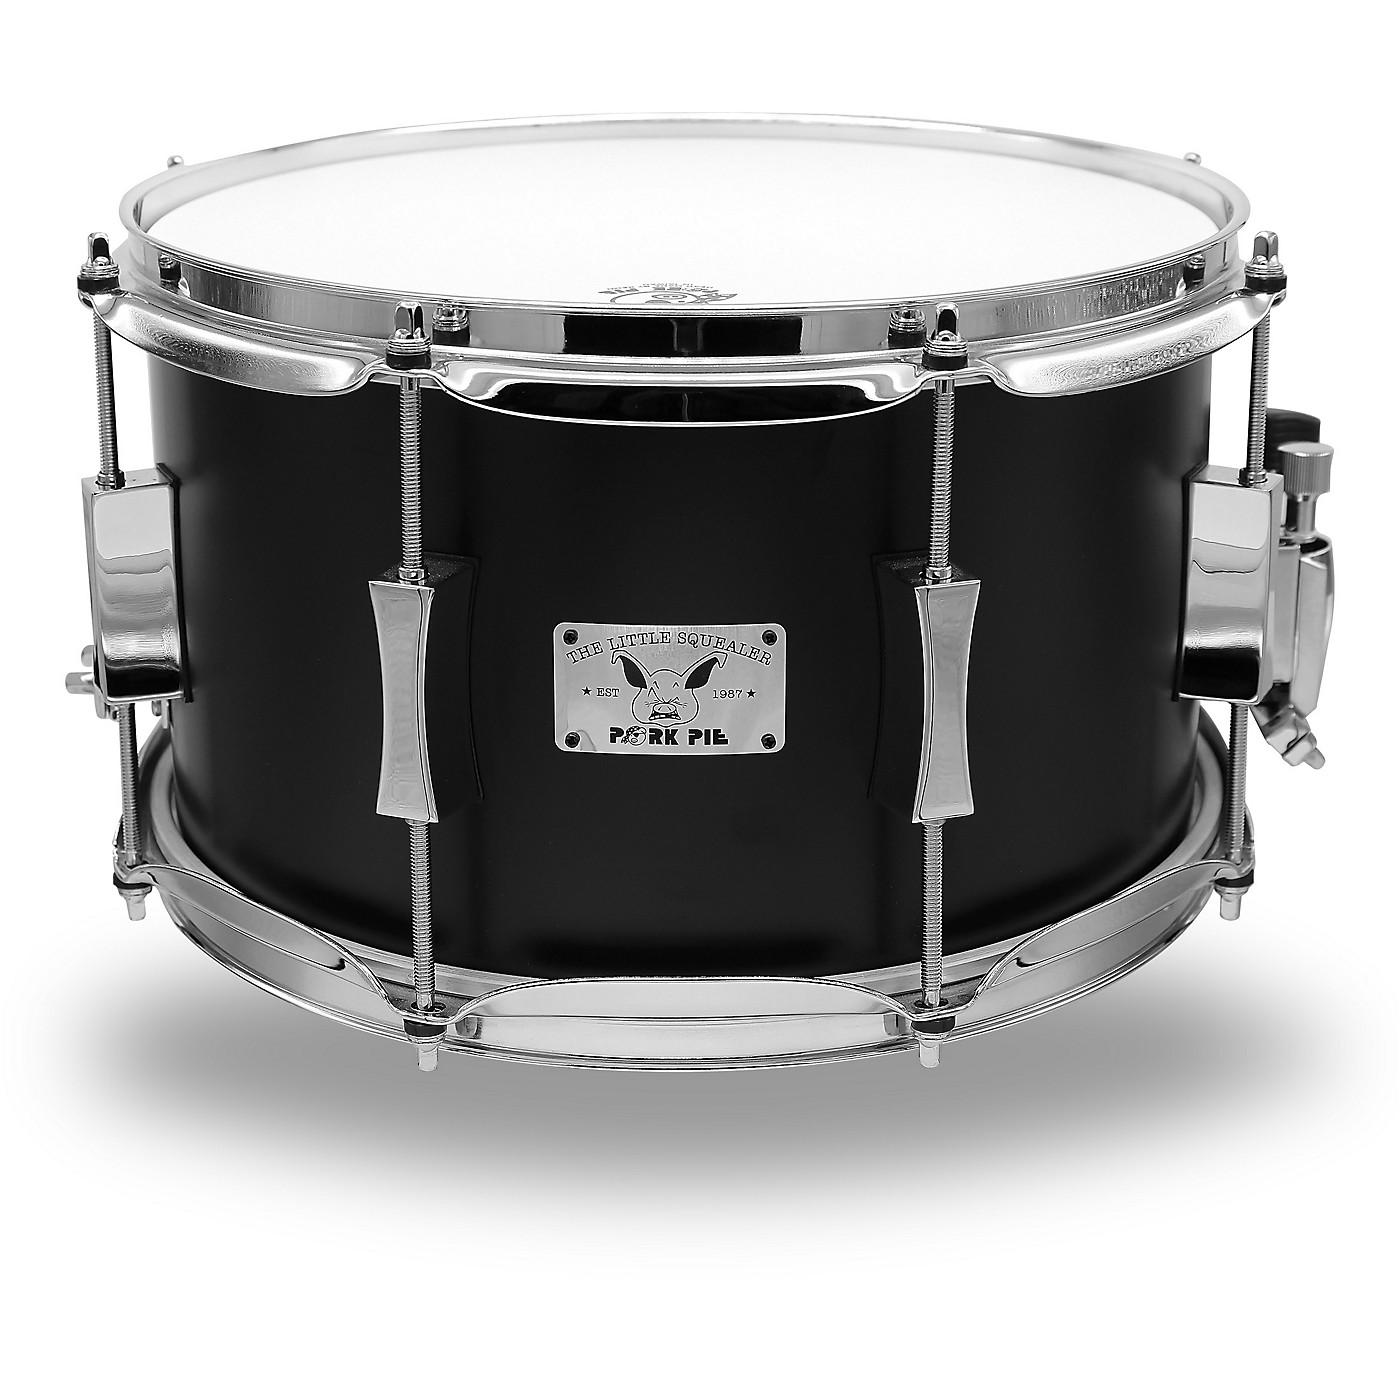 Pork Pie Little Squealer Flat Black Snare Drum thumbnail